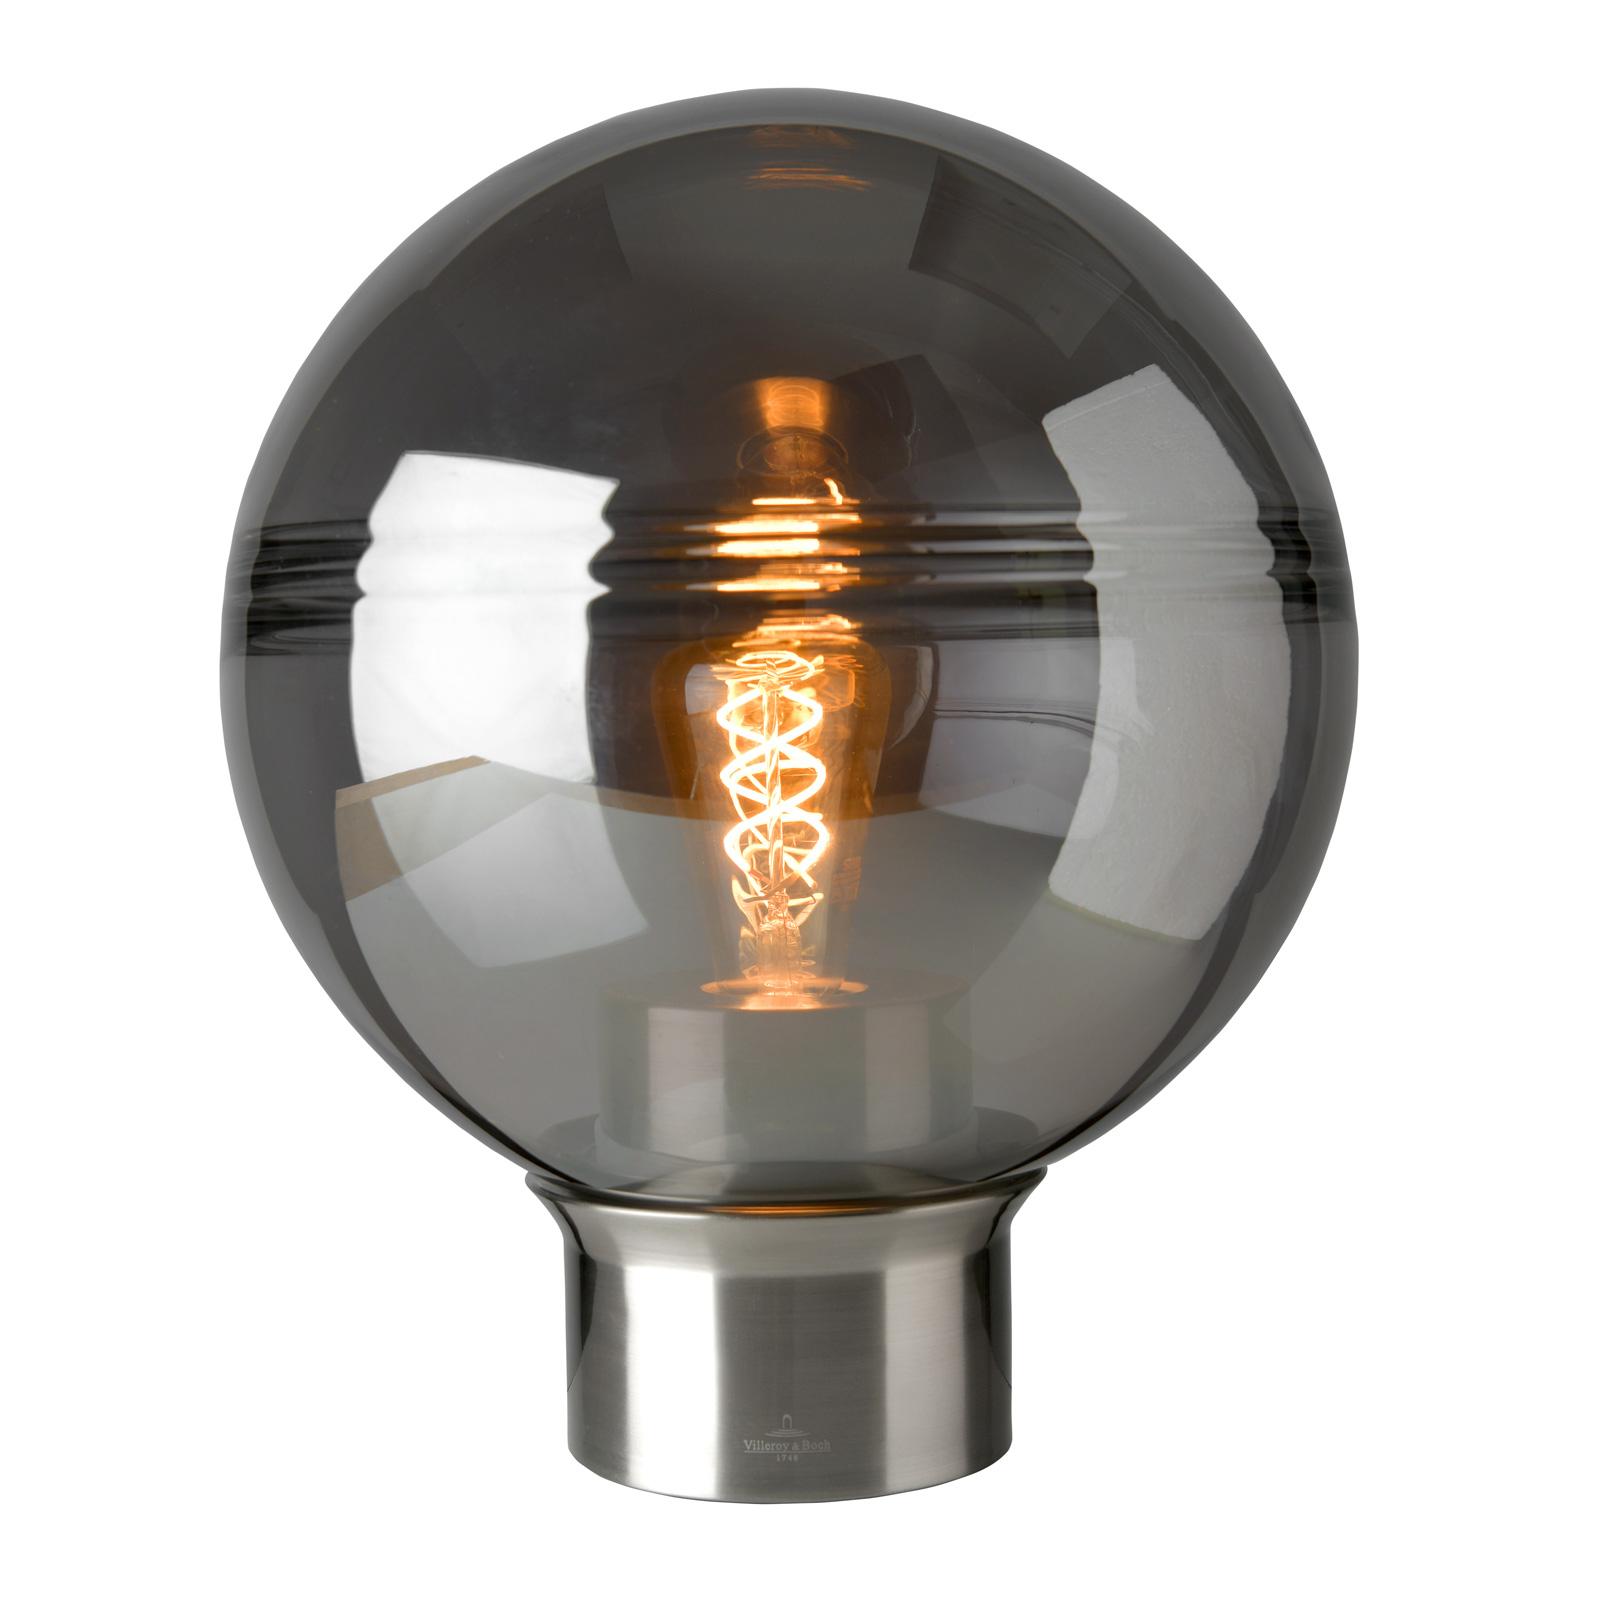 Villeroy & Boch Tokio pöytälamppu, satiini Ø 30 cm